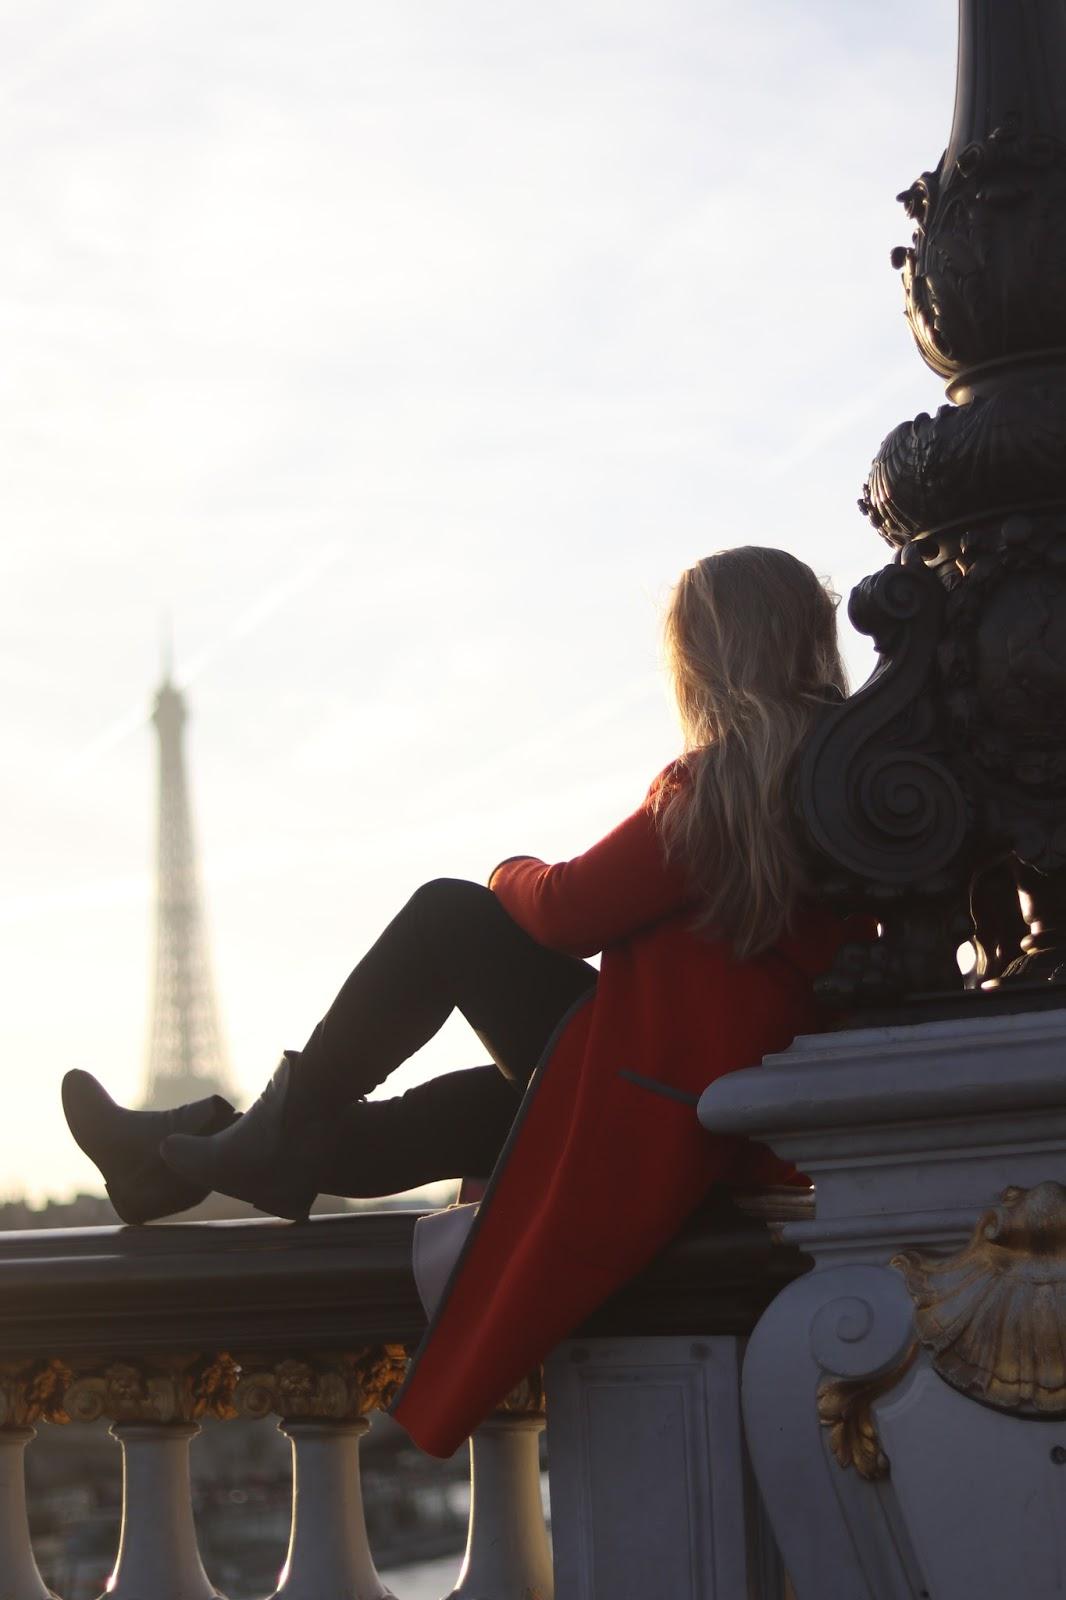 Pont Alexandre III Bridge, Paris, France, KALANCHOE, Katie Heath